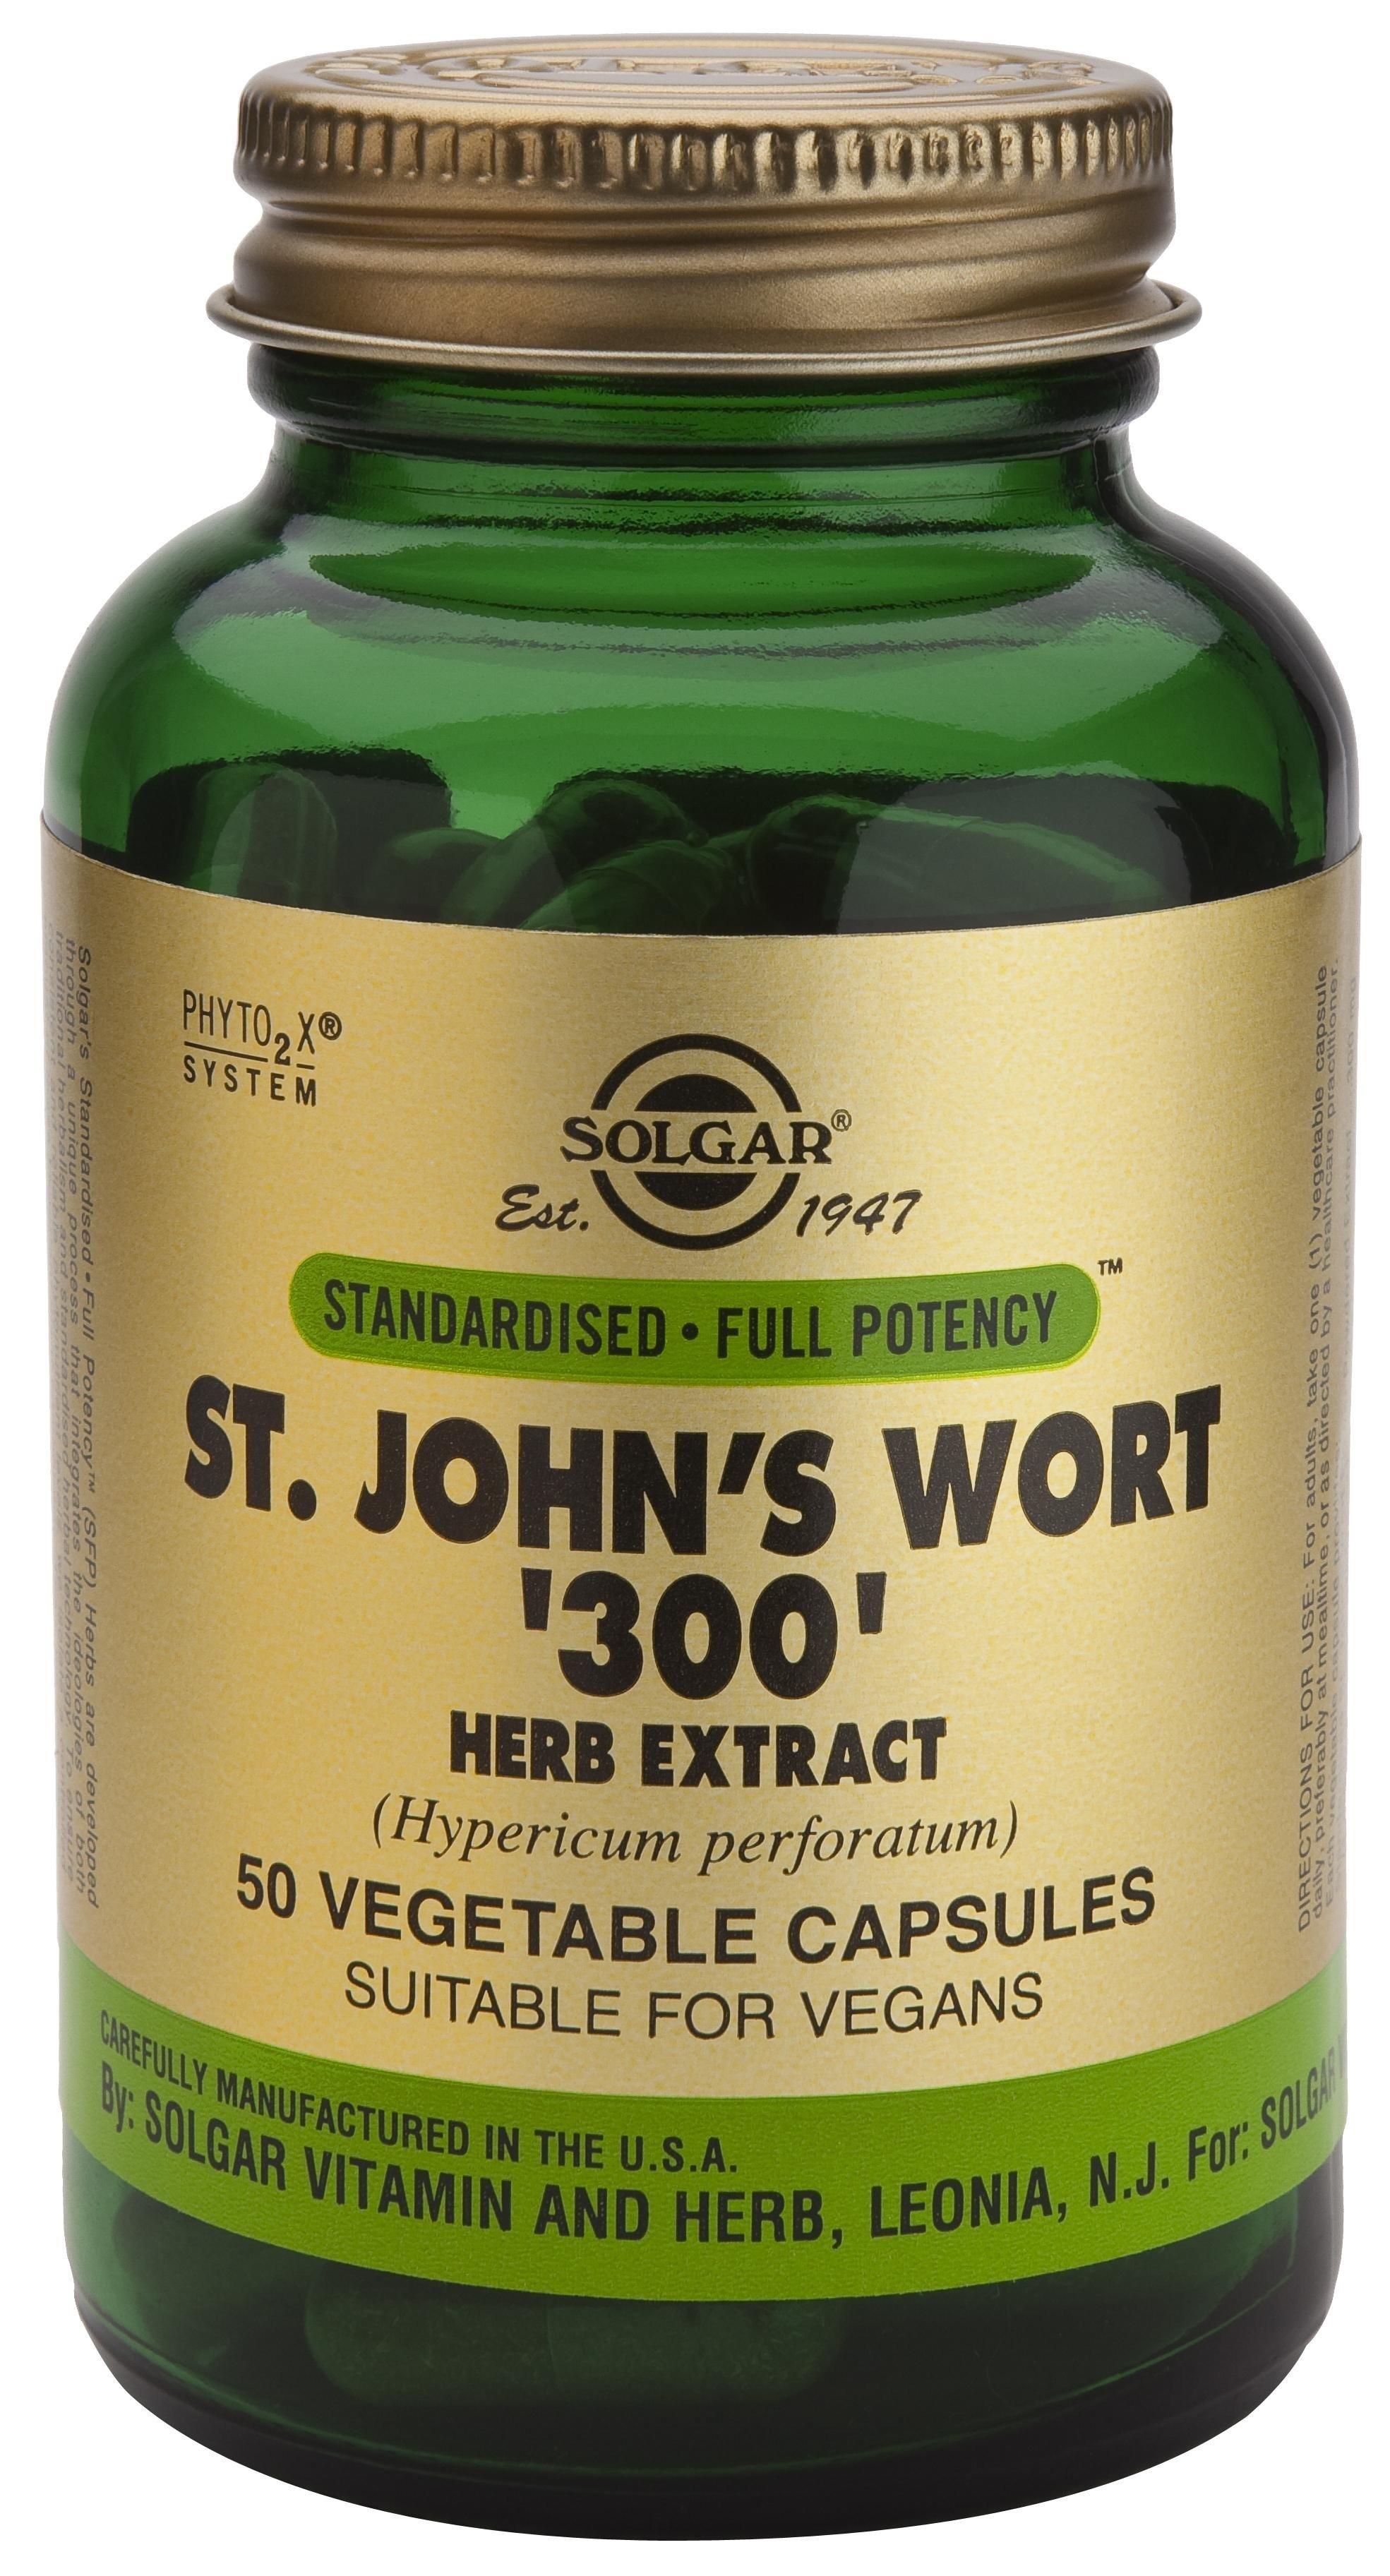 Solgar Sfp St. John's Wort Herb Extract Συμπλήρωμα Διατροφής με Αντικαταθλιπτικές Ιδιότητες veg.caps – 300mg 50veg.caps